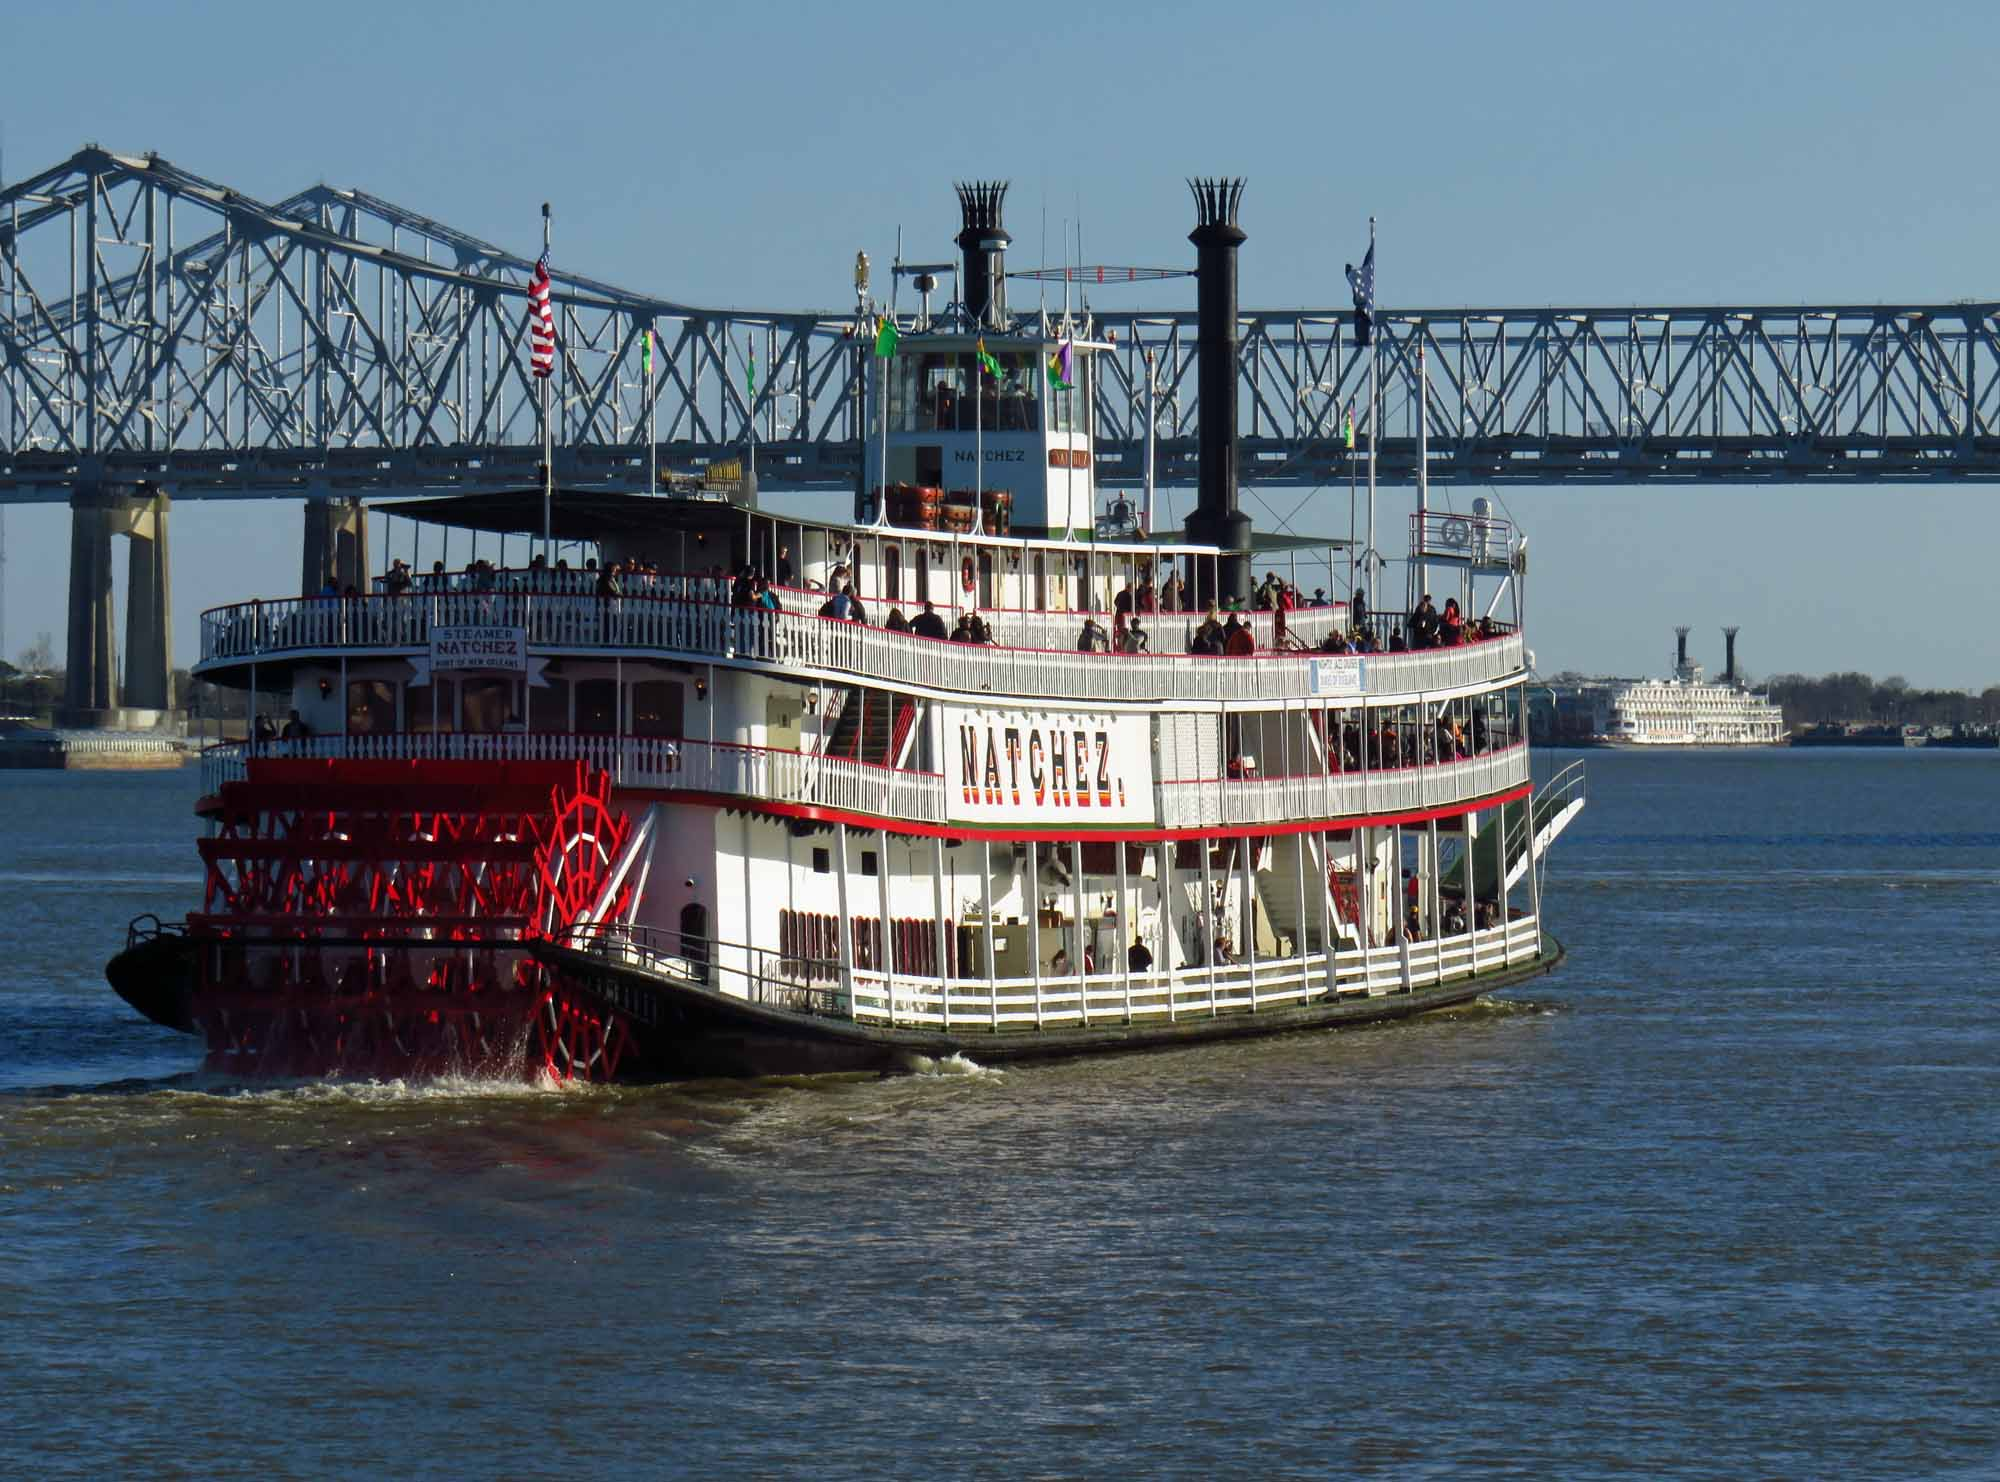 Natchez Steamboat passing by the Crescent City Bridges